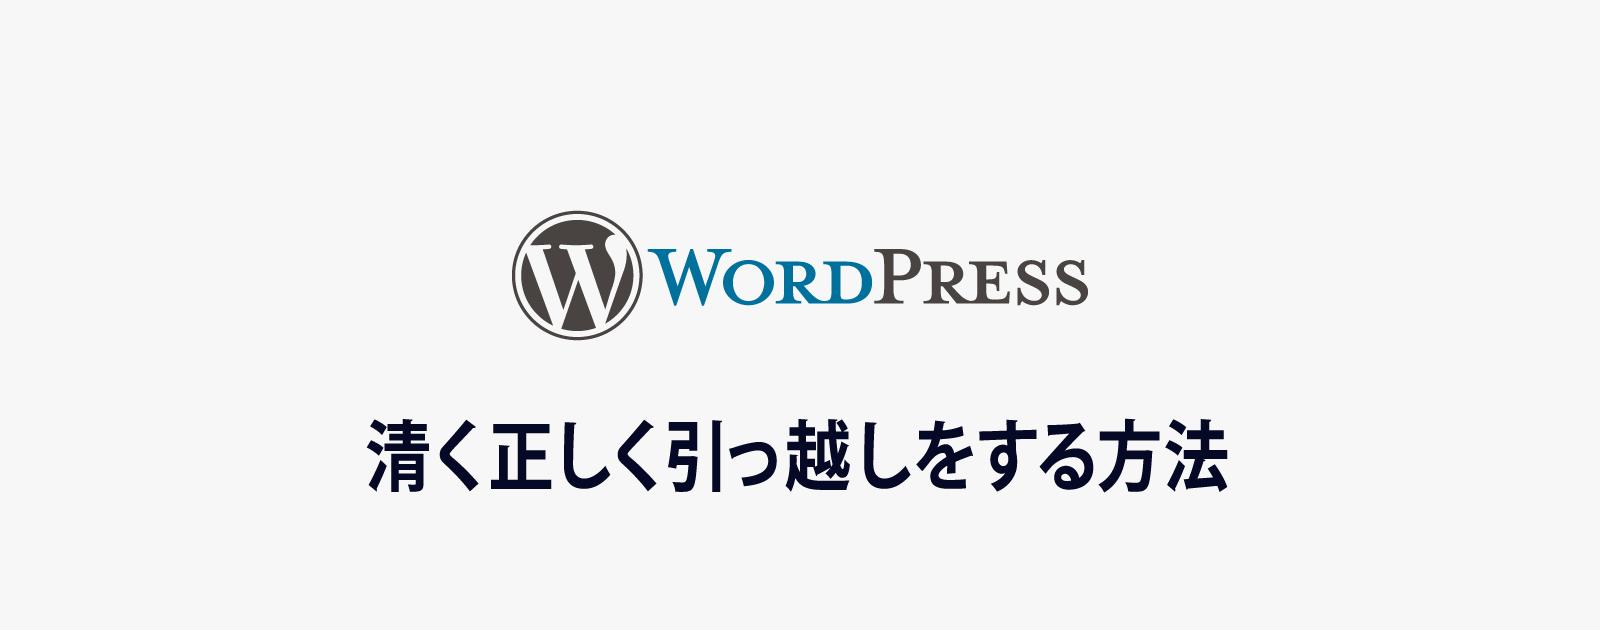 WordPressを別サーバーへ清く正しく引っ越しする方法